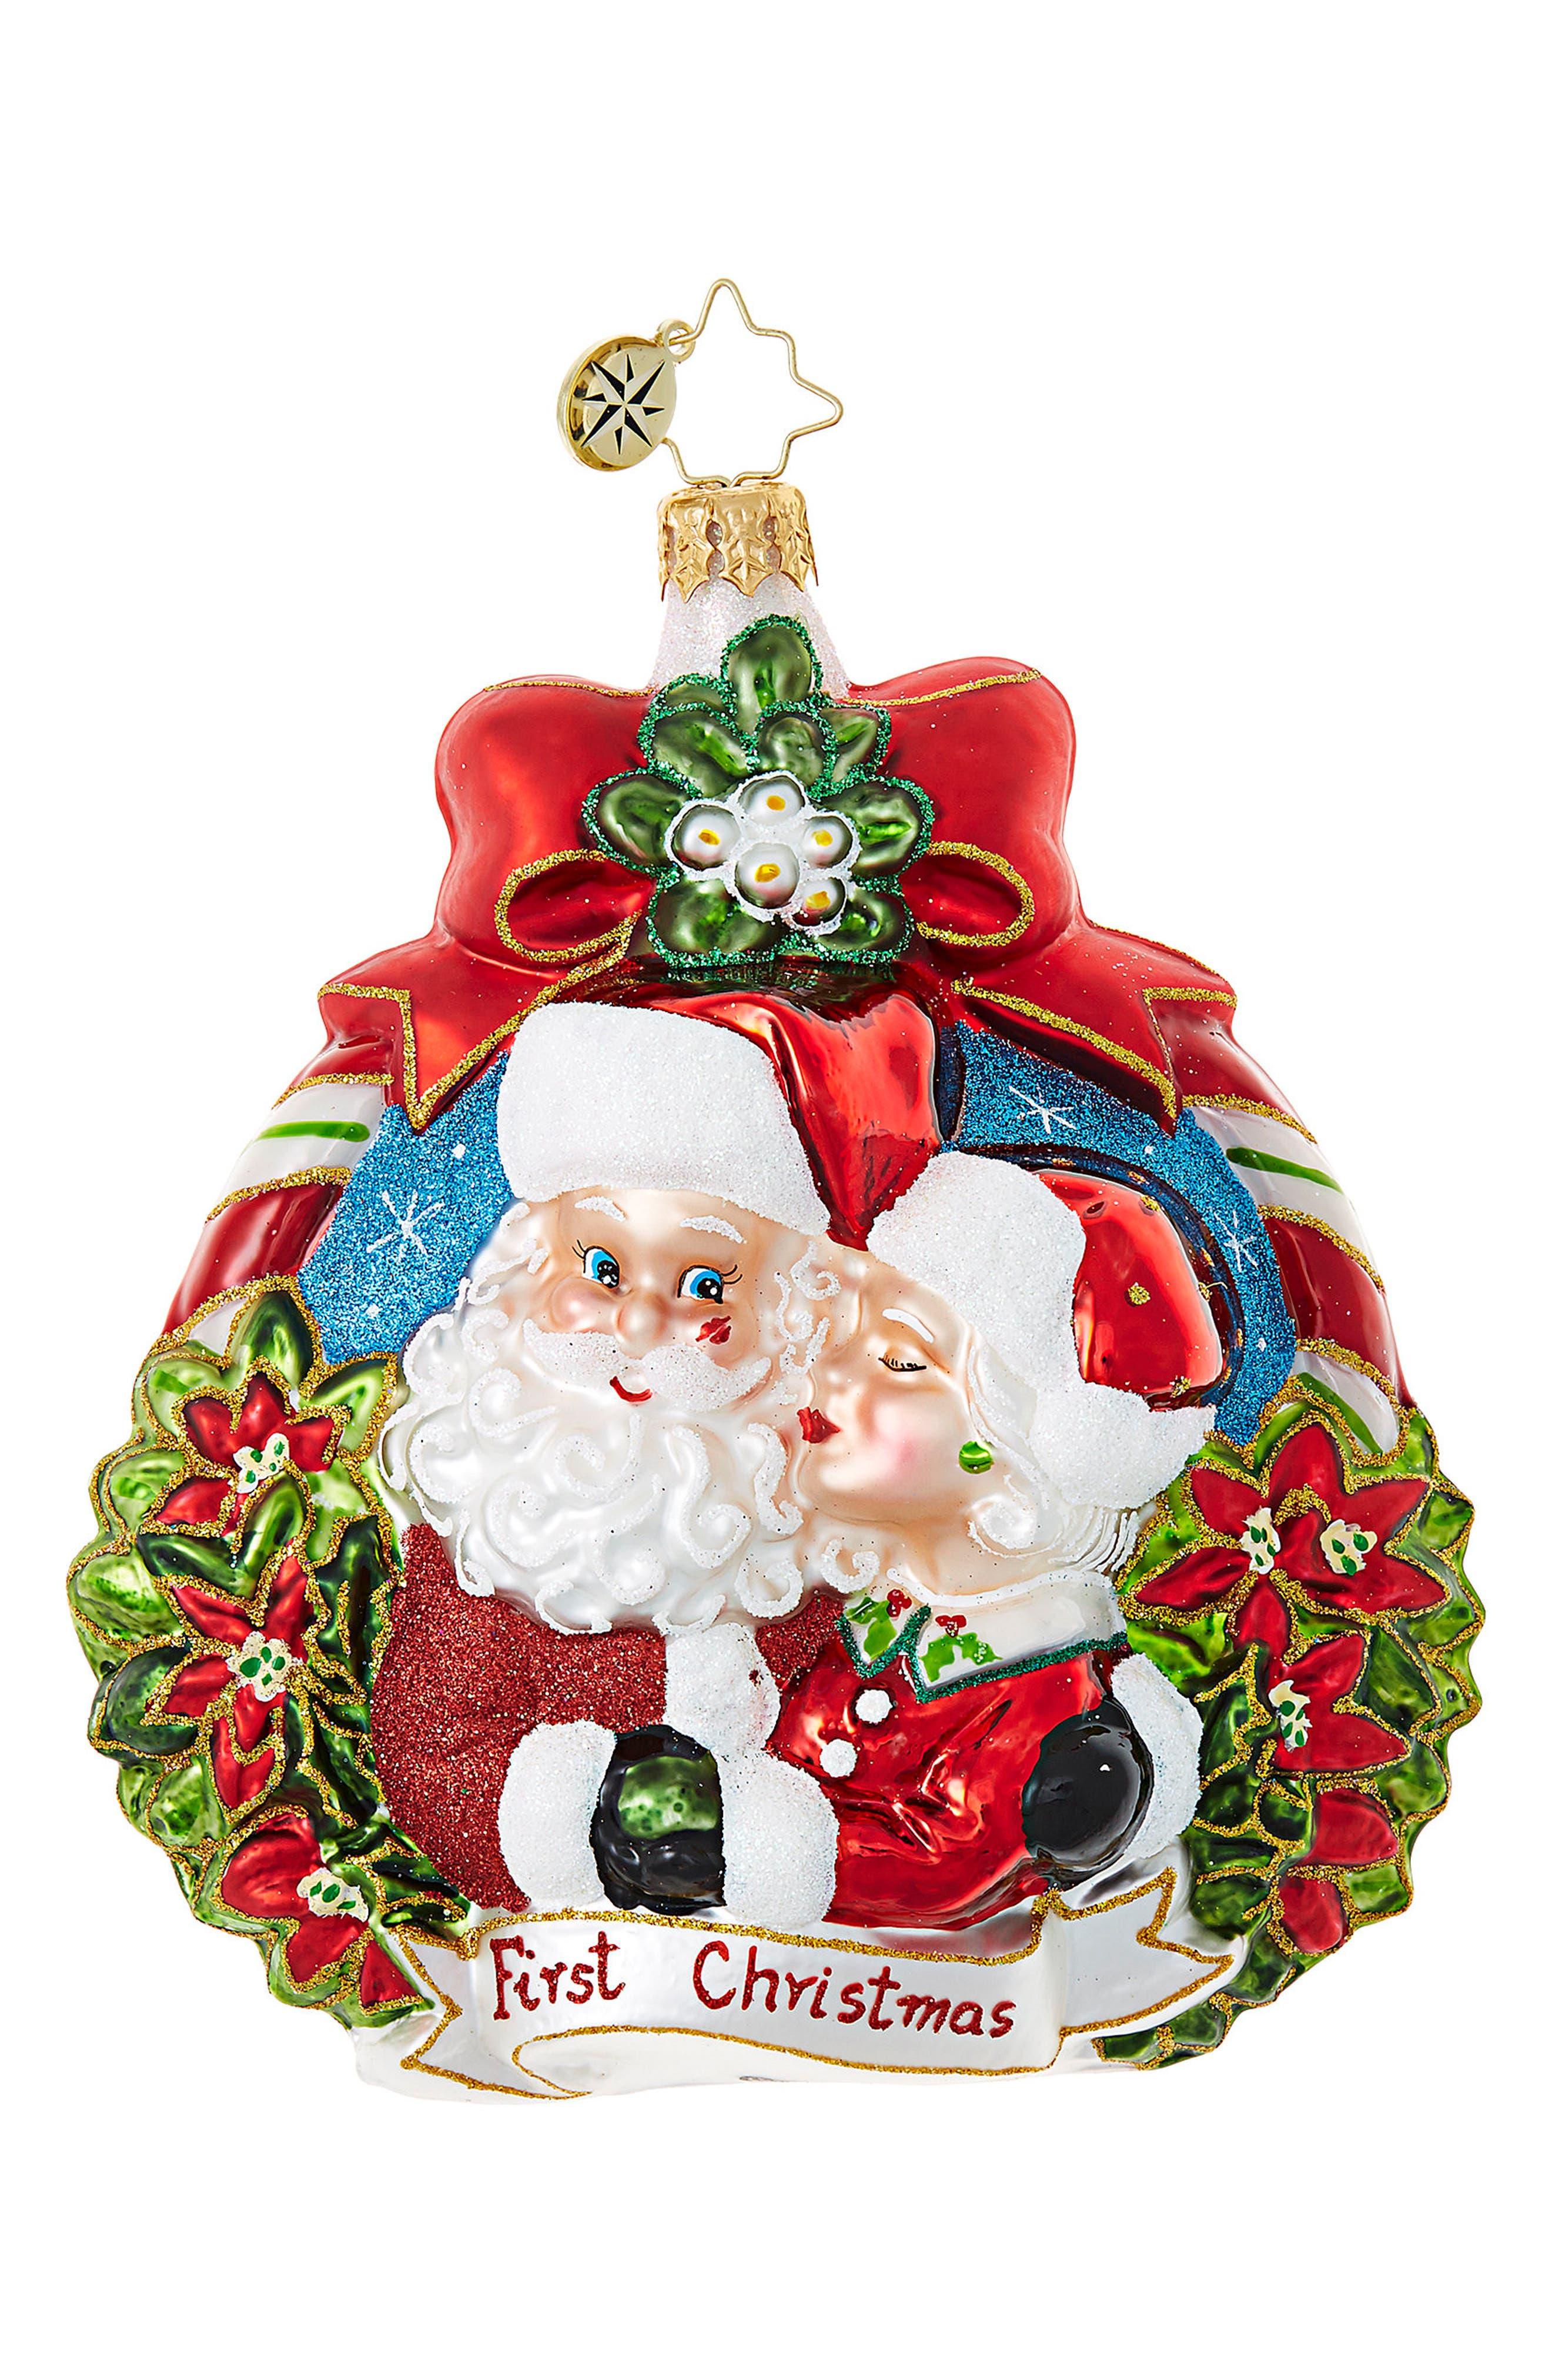 Main Image - Christopher Radko First Christmas Glass Ornament